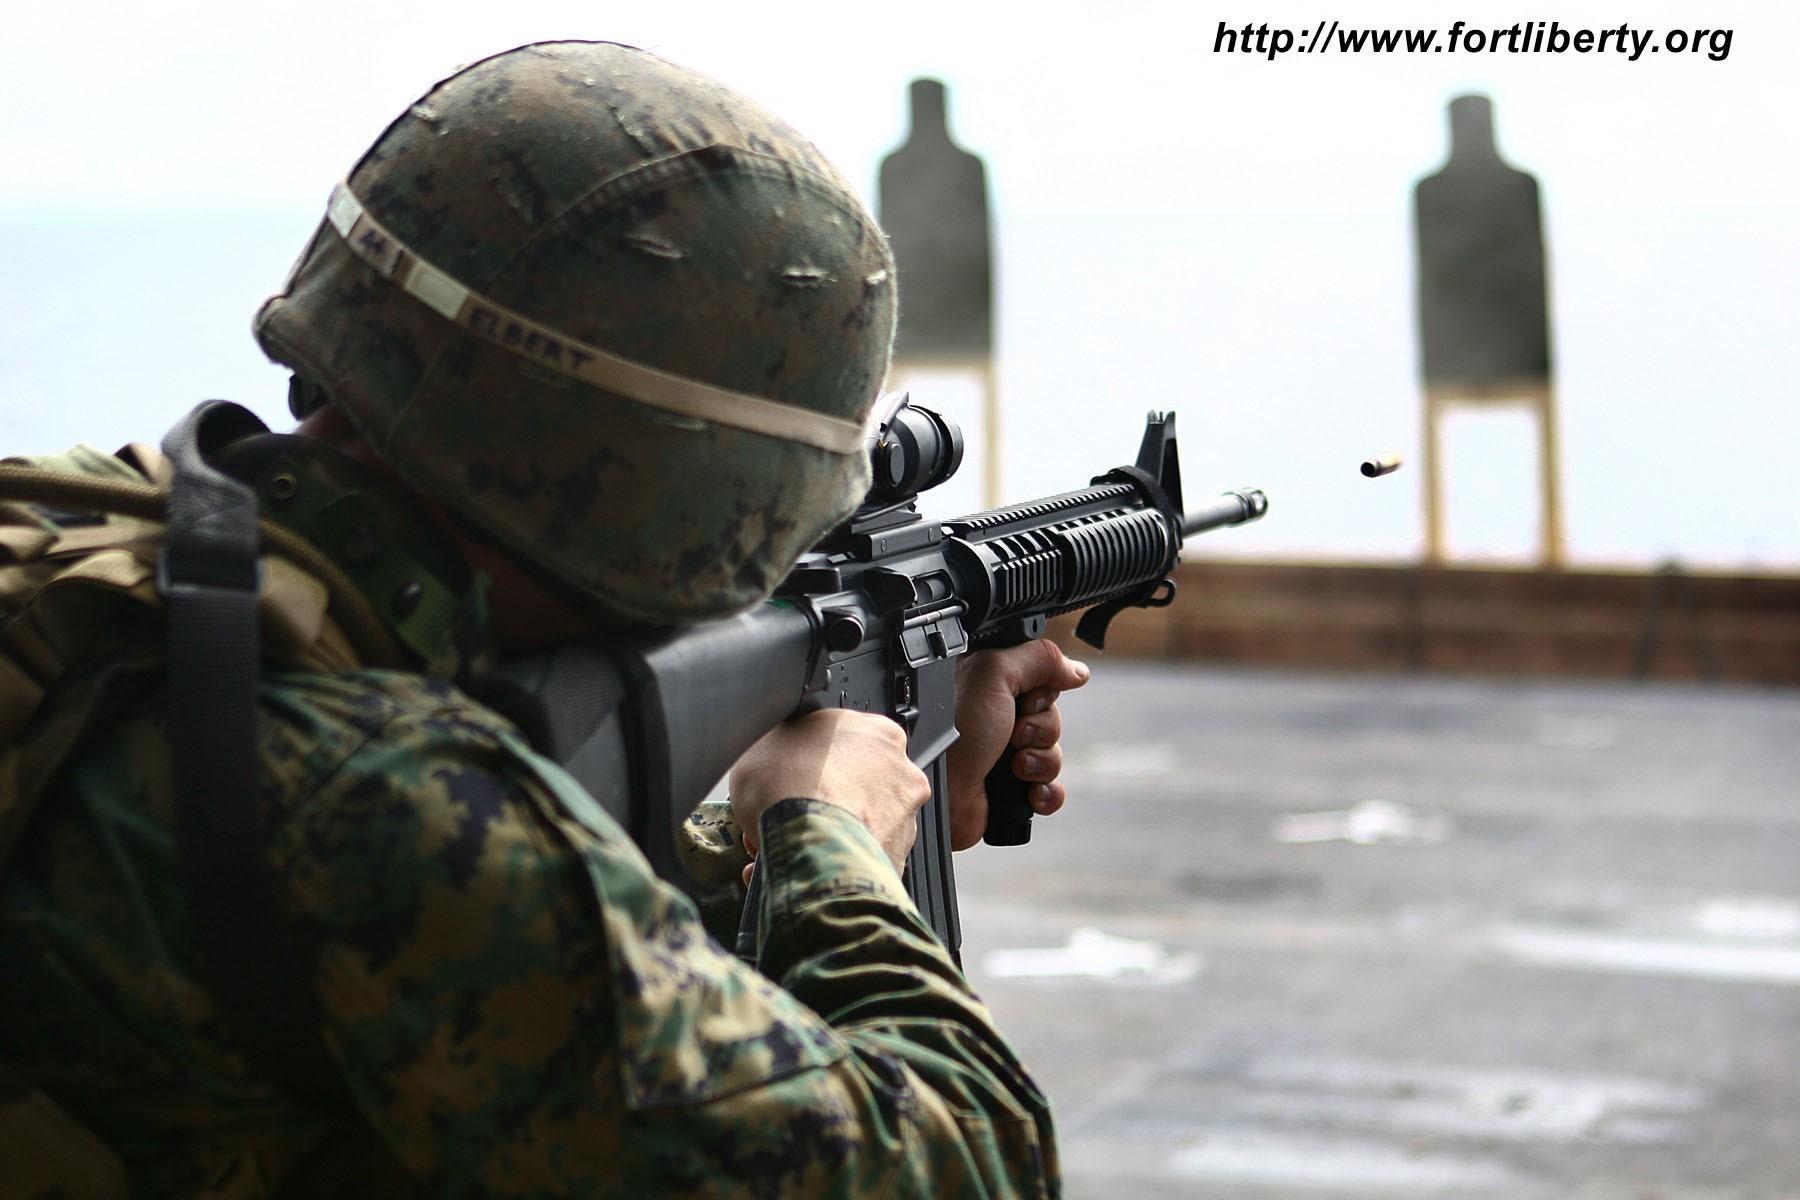 Marine Corps Screensaver   US Marine Corps Screensaver 1800x1200